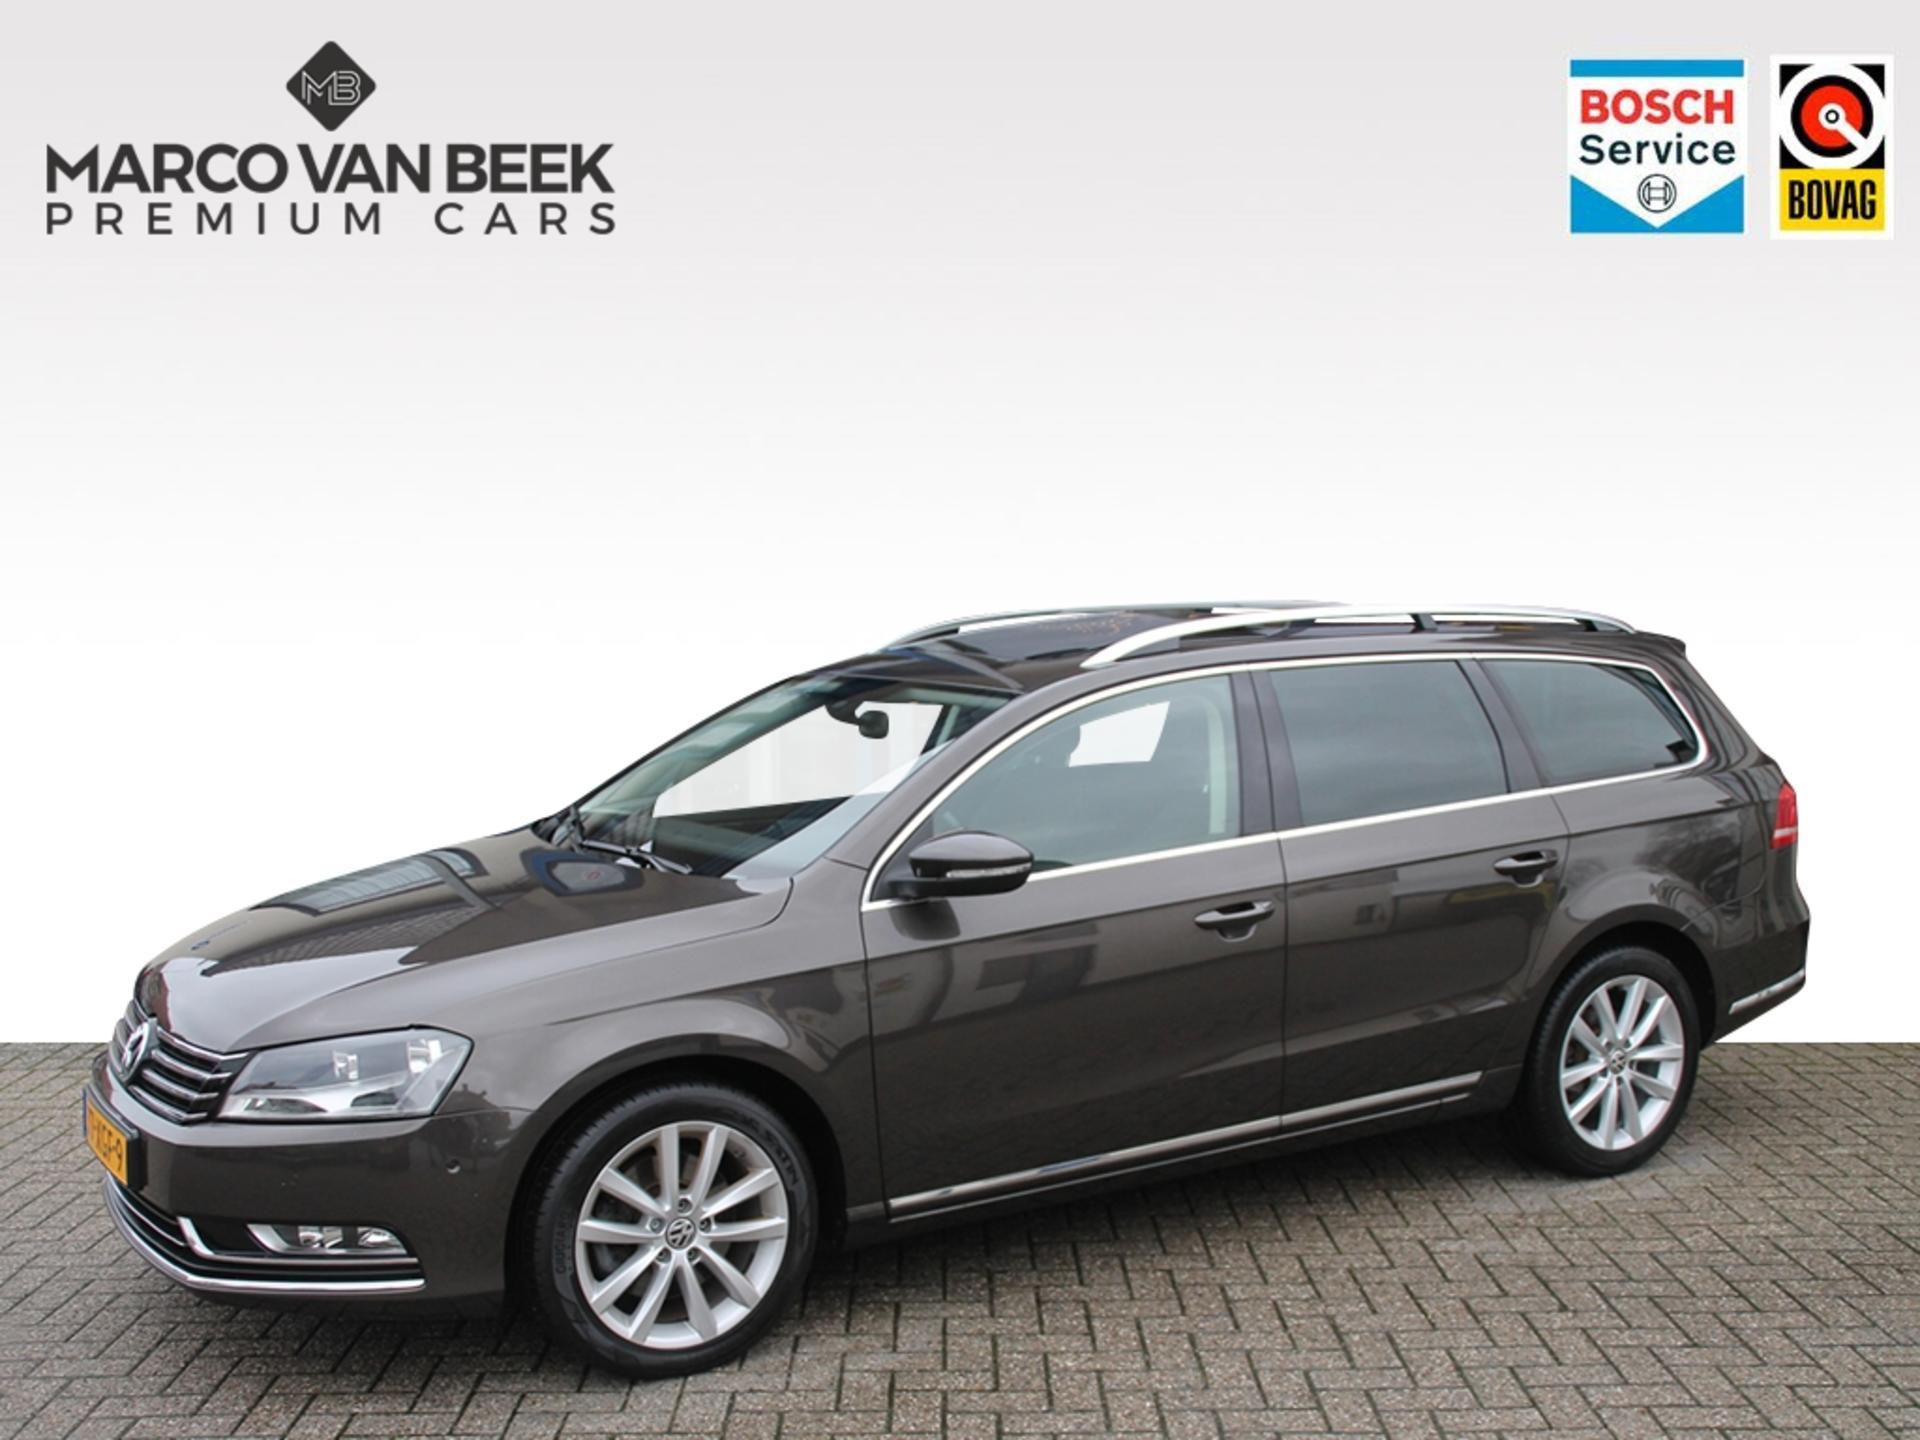 Volkswagen Passat Variant 1.6 tdi high executive navi pano verkocht